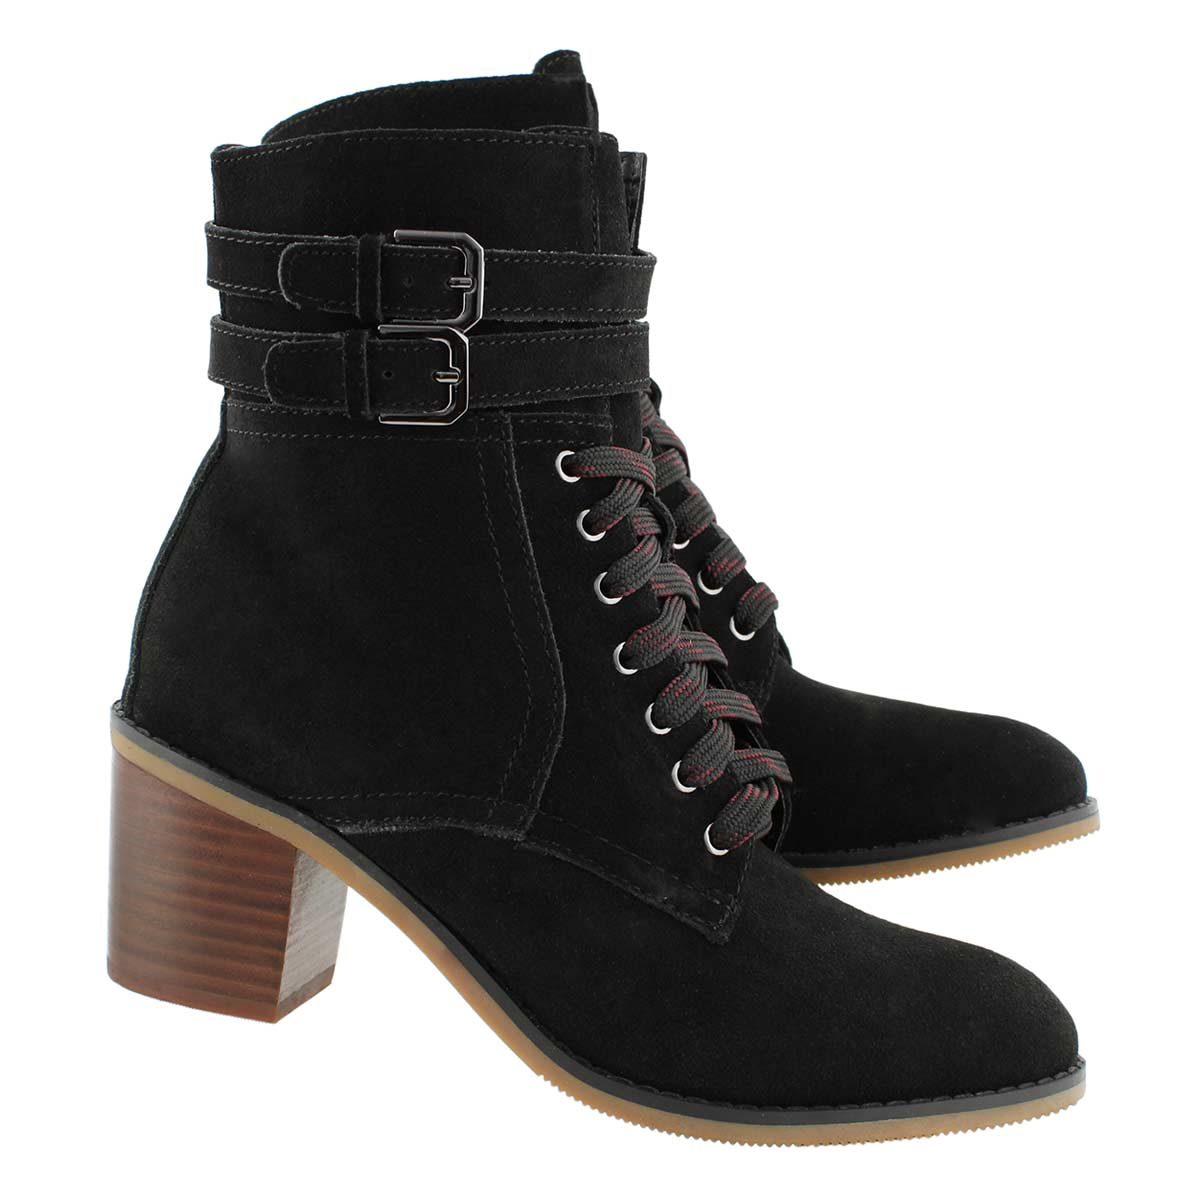 Lds Caroli blk wtpf ankle boot